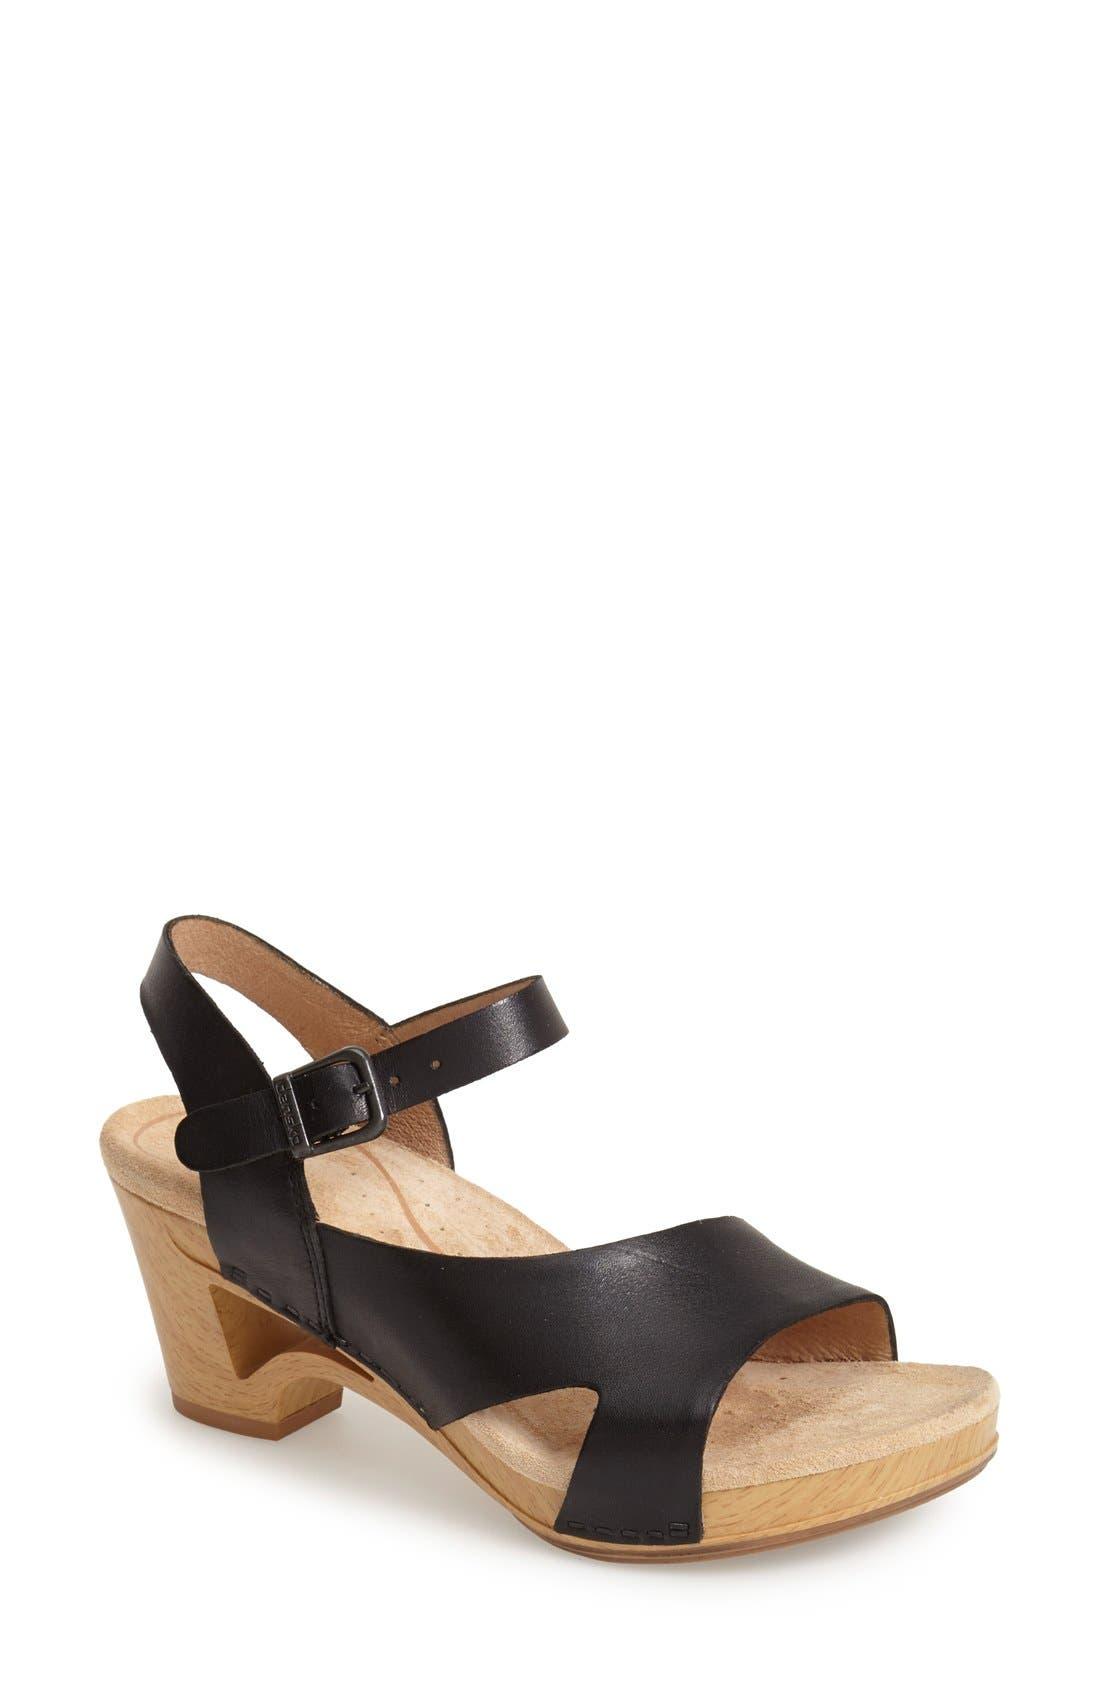 Alternate Image 1 Selected - Dansko 'Tasha' Sandal